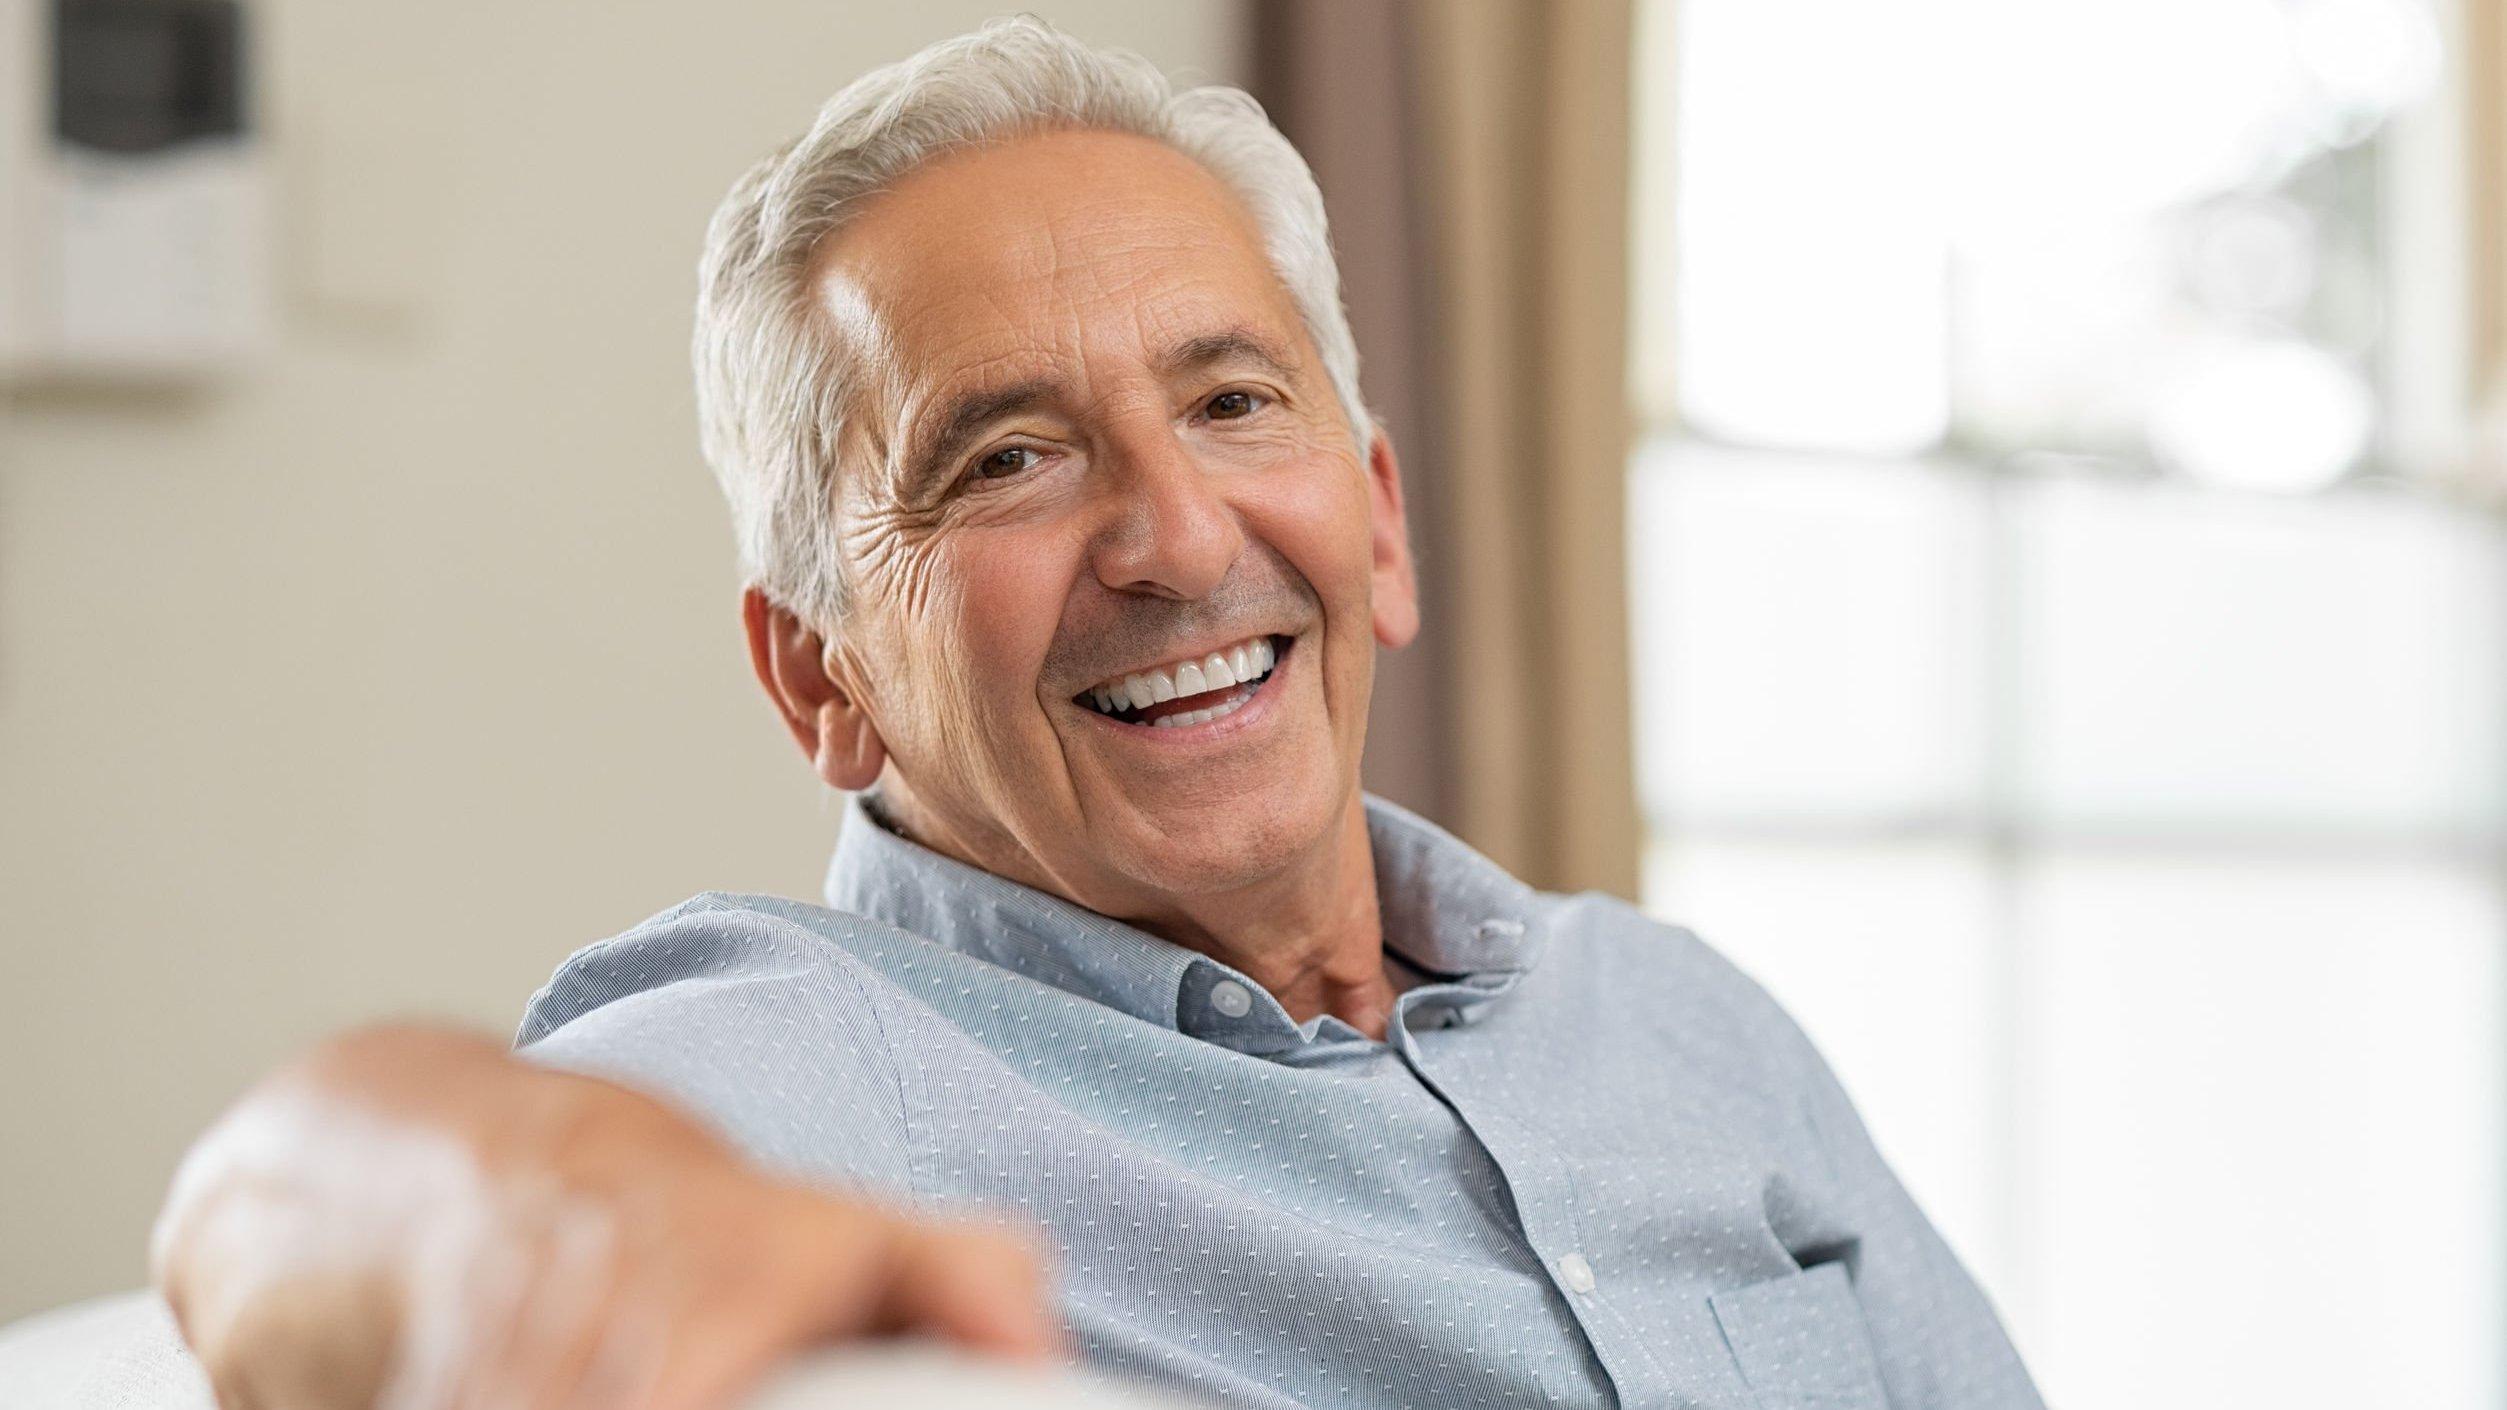 Homem branco idoso